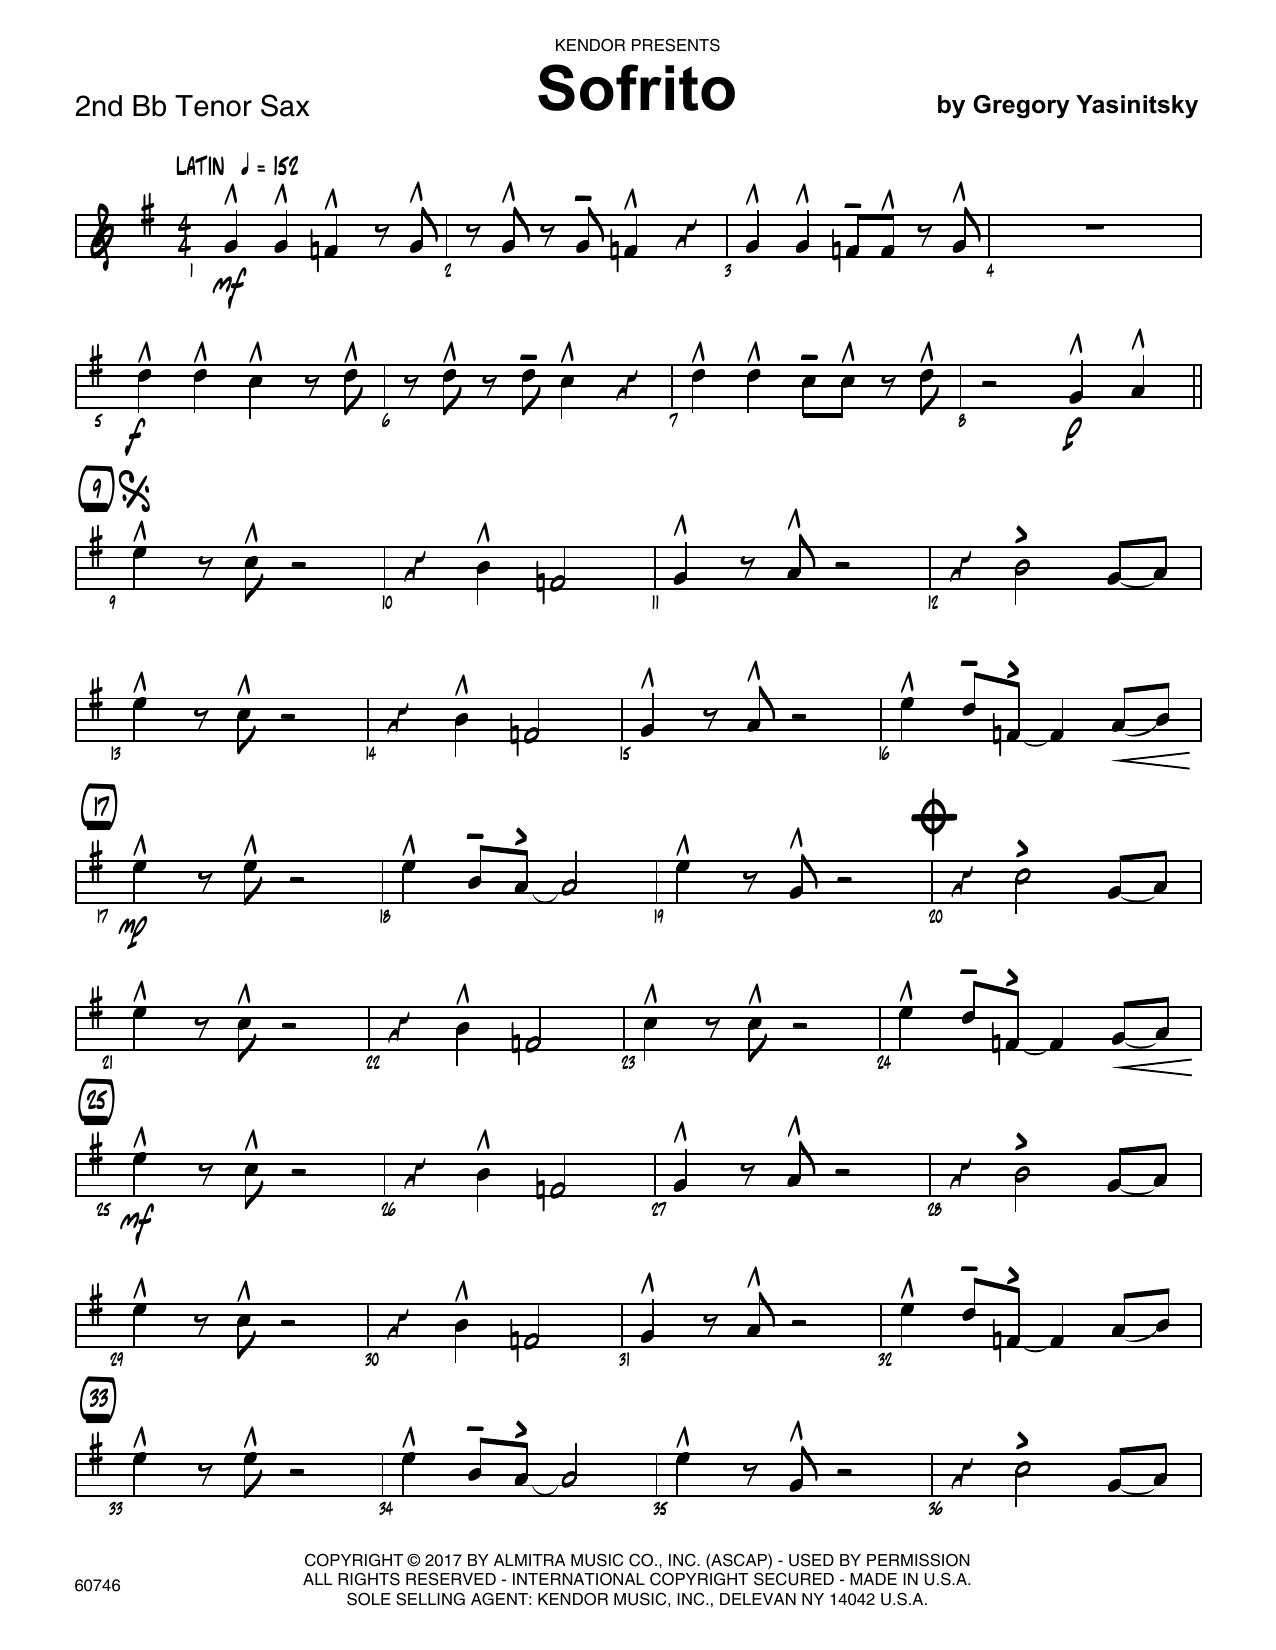 Sofrito - 2nd Bb Tenor Saxophone Sheet Music